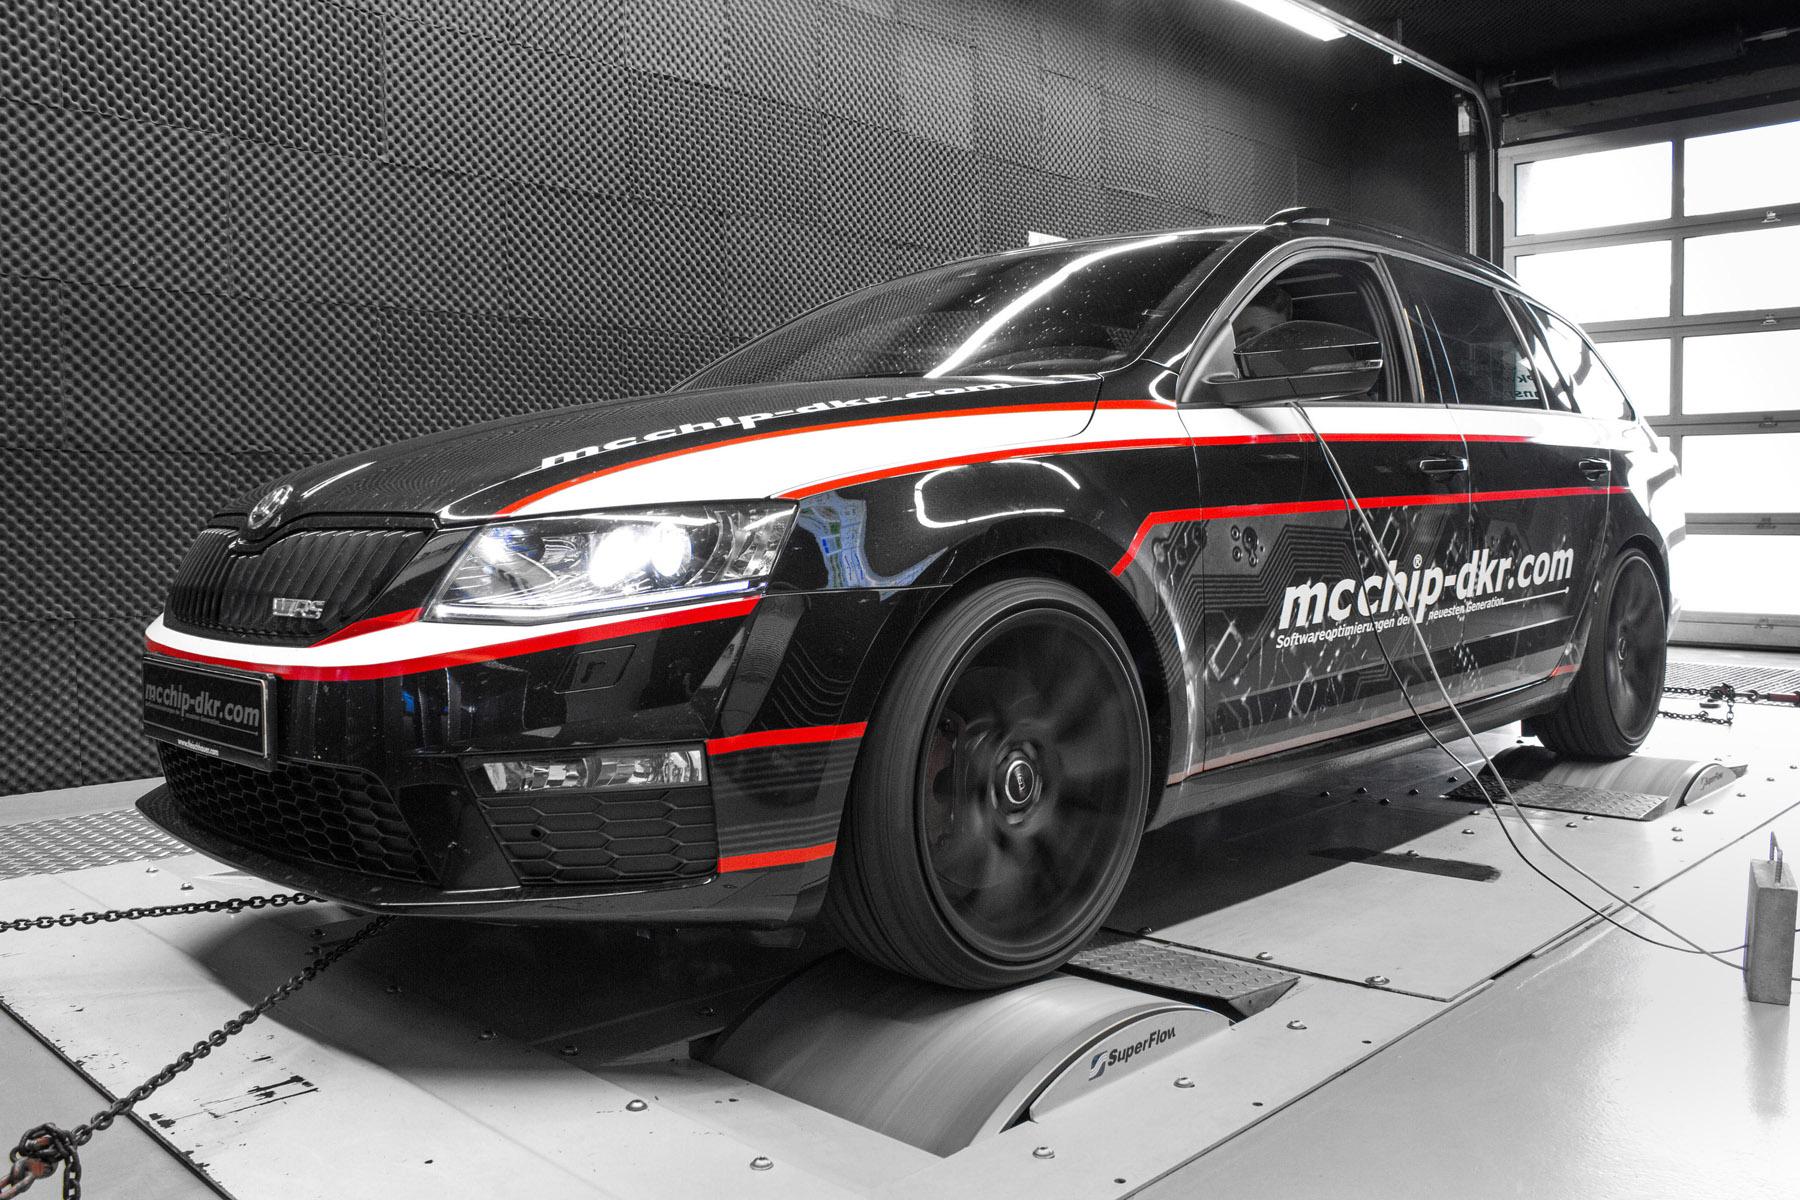 2014 MCCHIP-DKR Skoda Octavia III